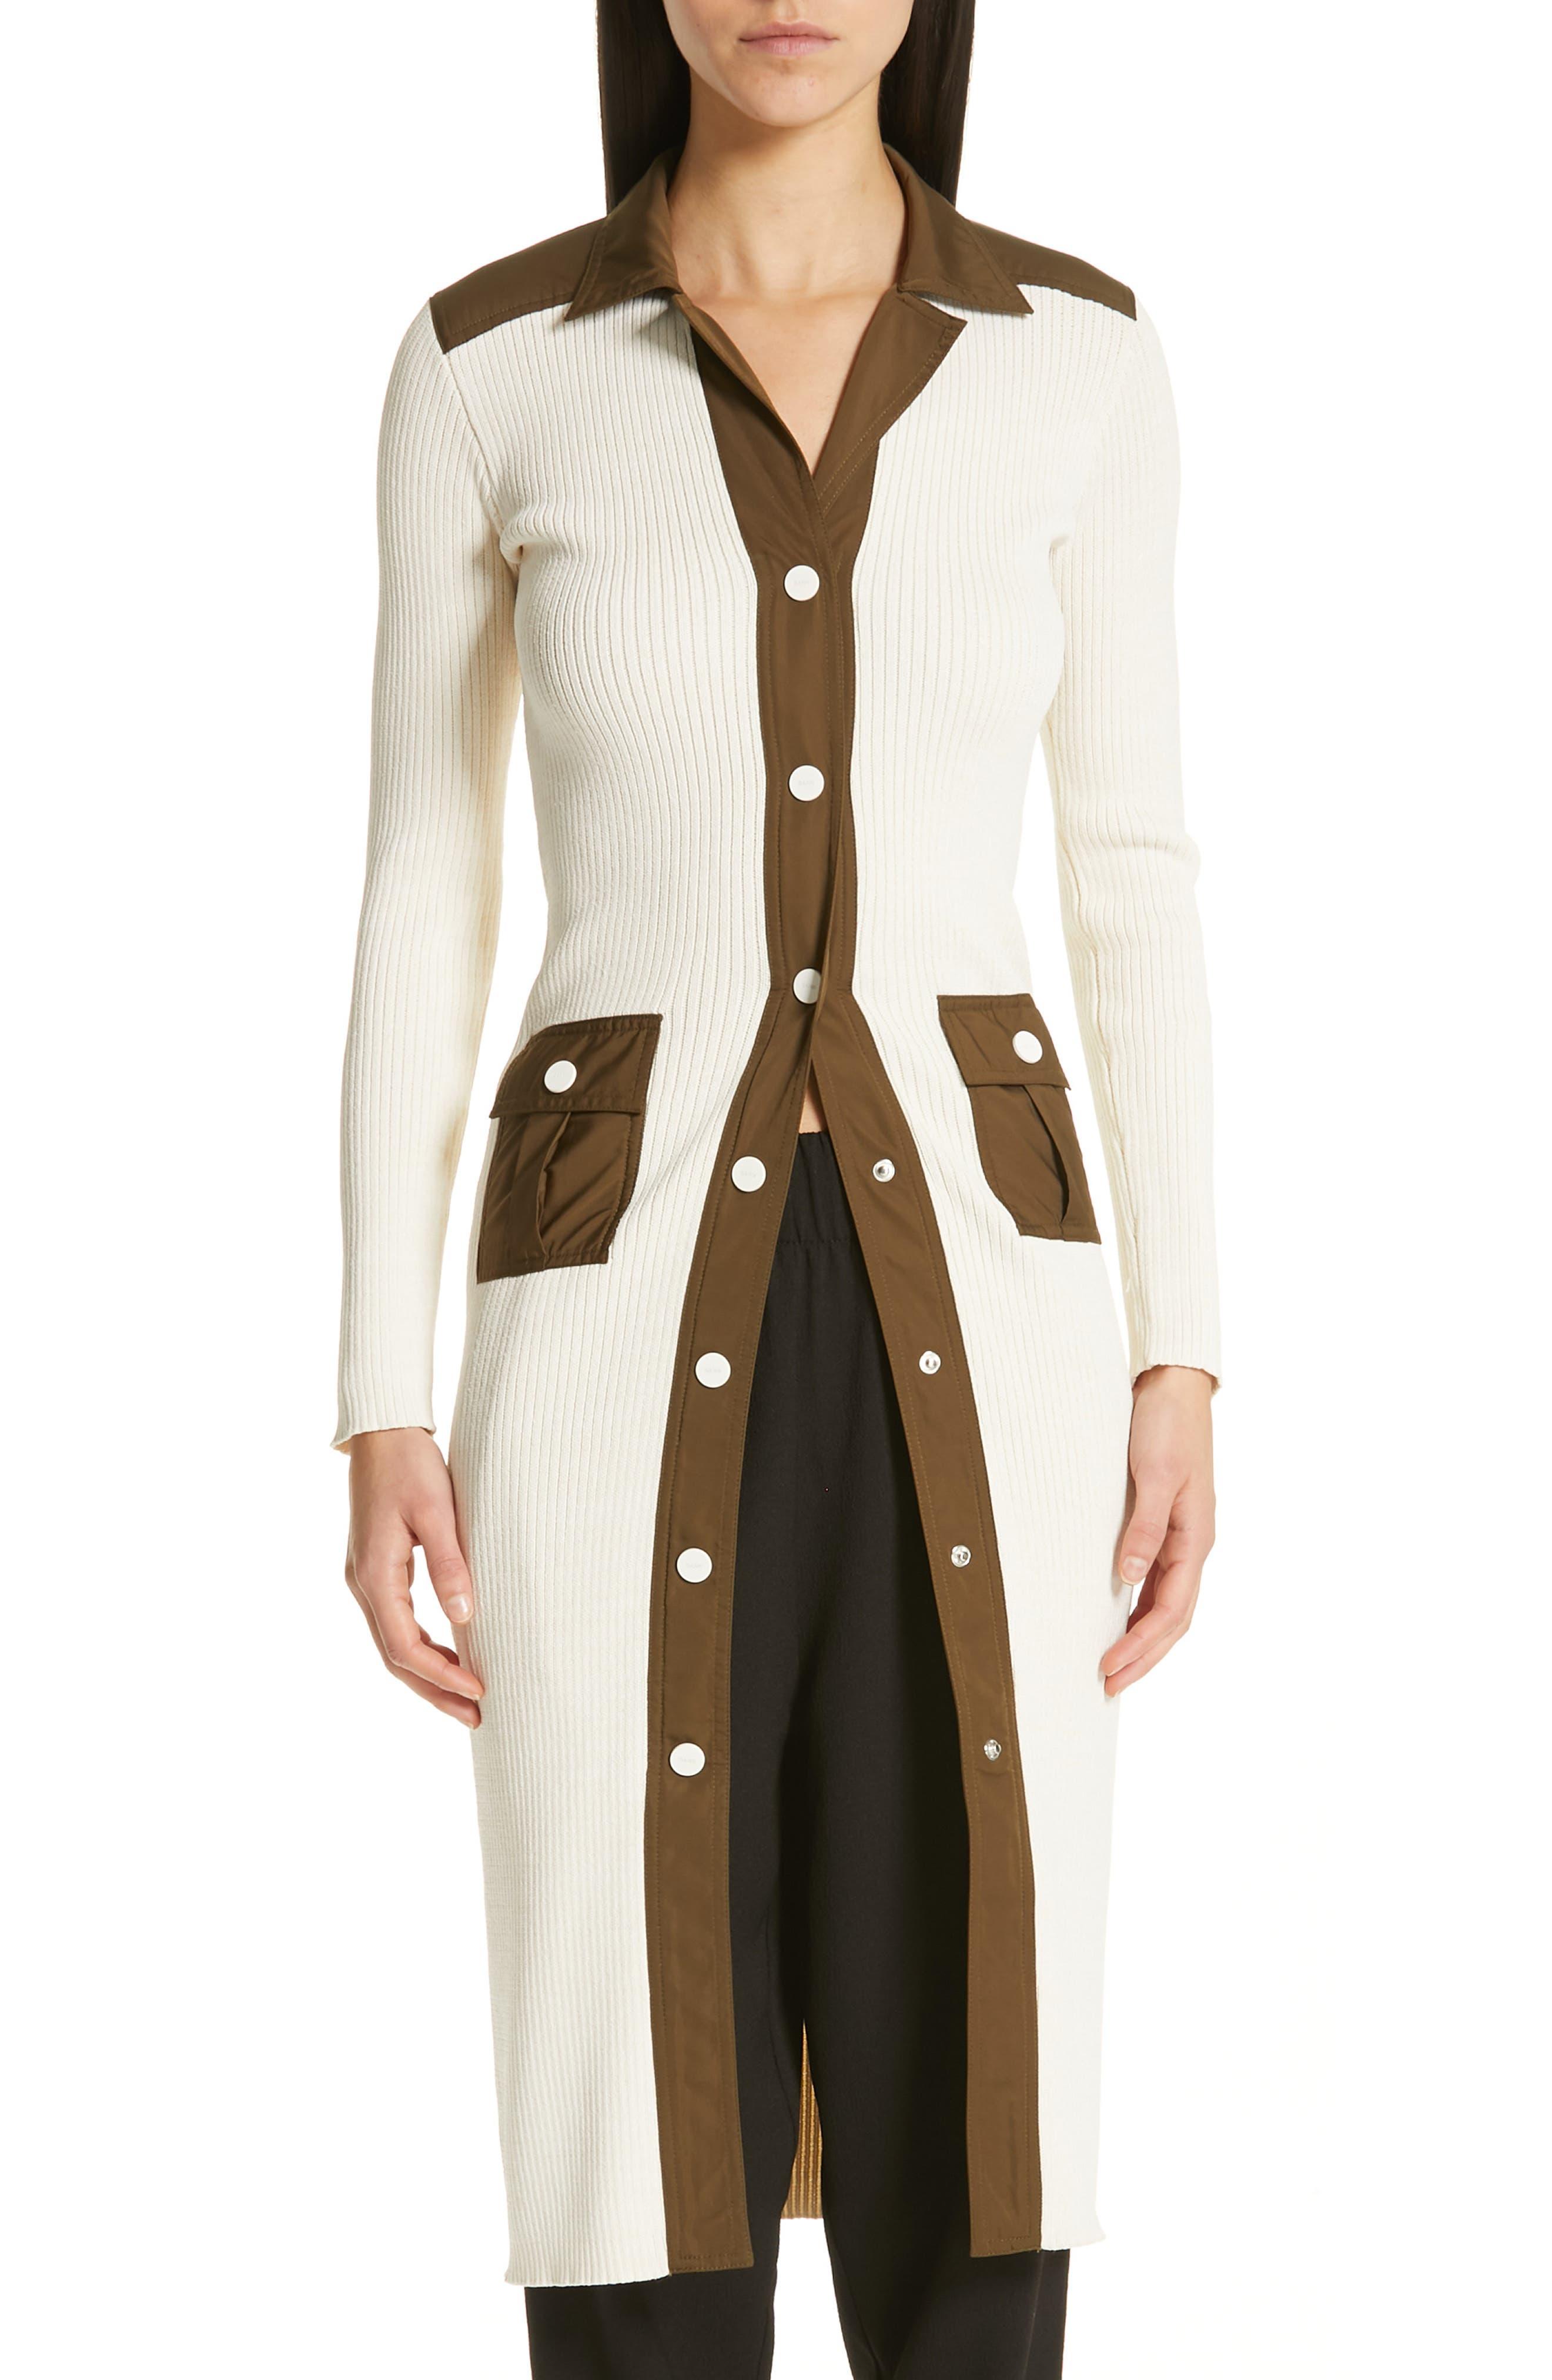 Ganni Tech Knit Cardigan Sweater Dress, Ivory